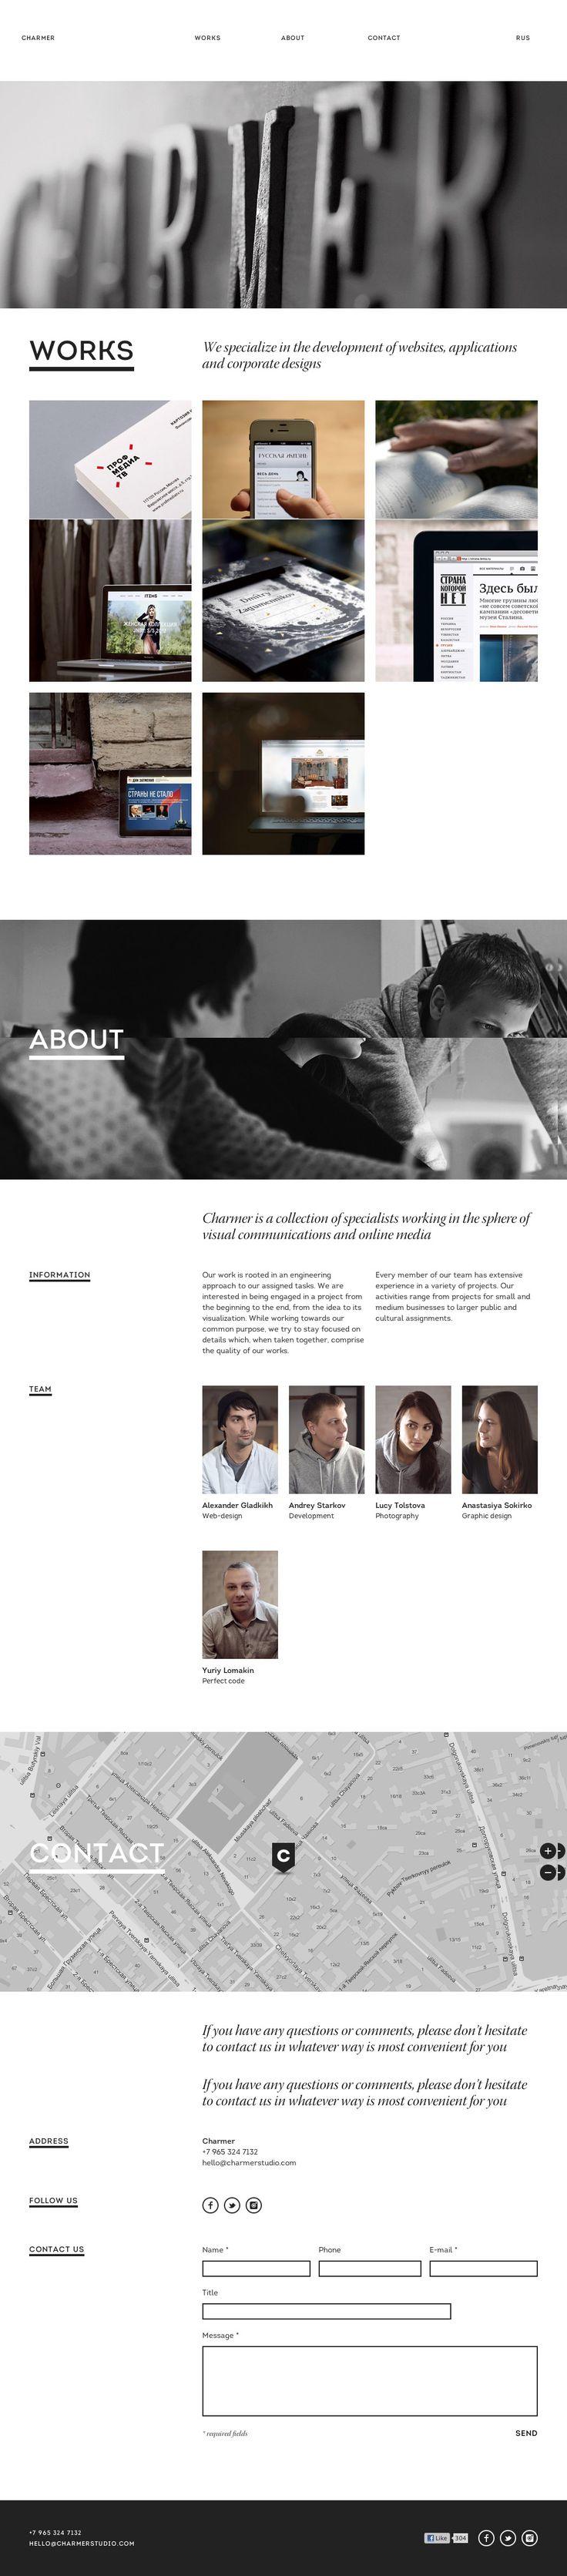 Charmer — Grid Based Websites Showcase —Grid Assault